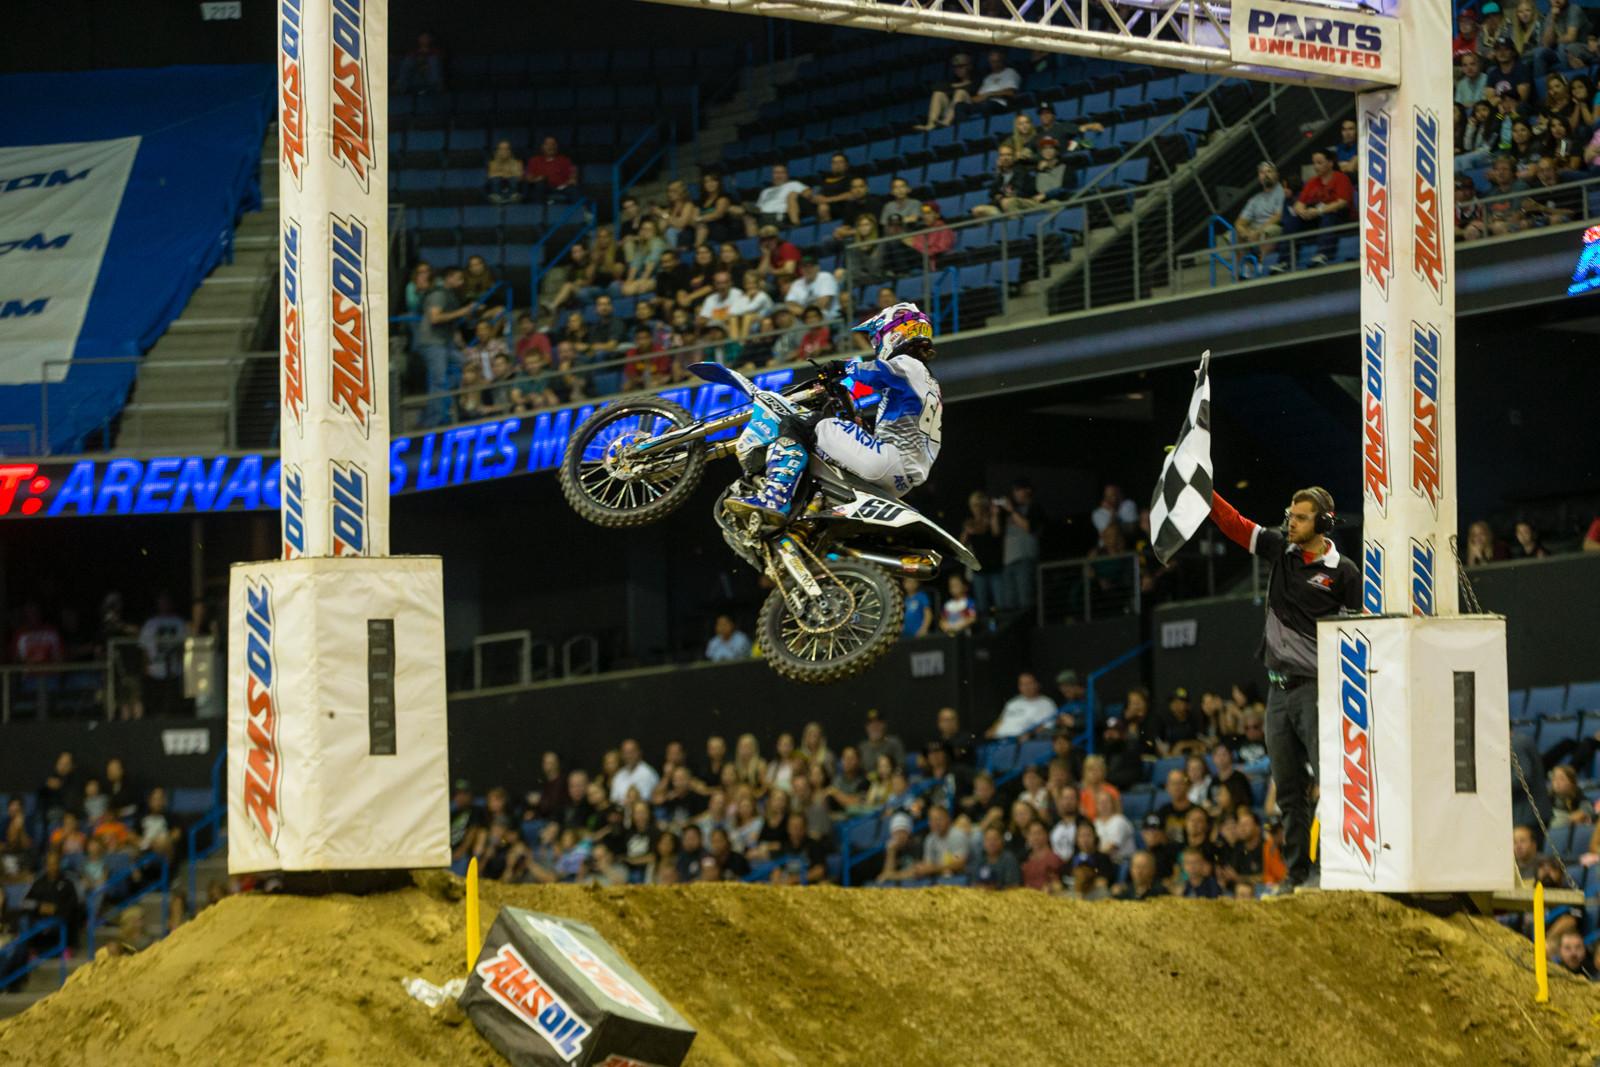 Stone Edler - Photo Gallery: Ontario Arenacross - Saturday Night - Motocross Pictures - Vital MX